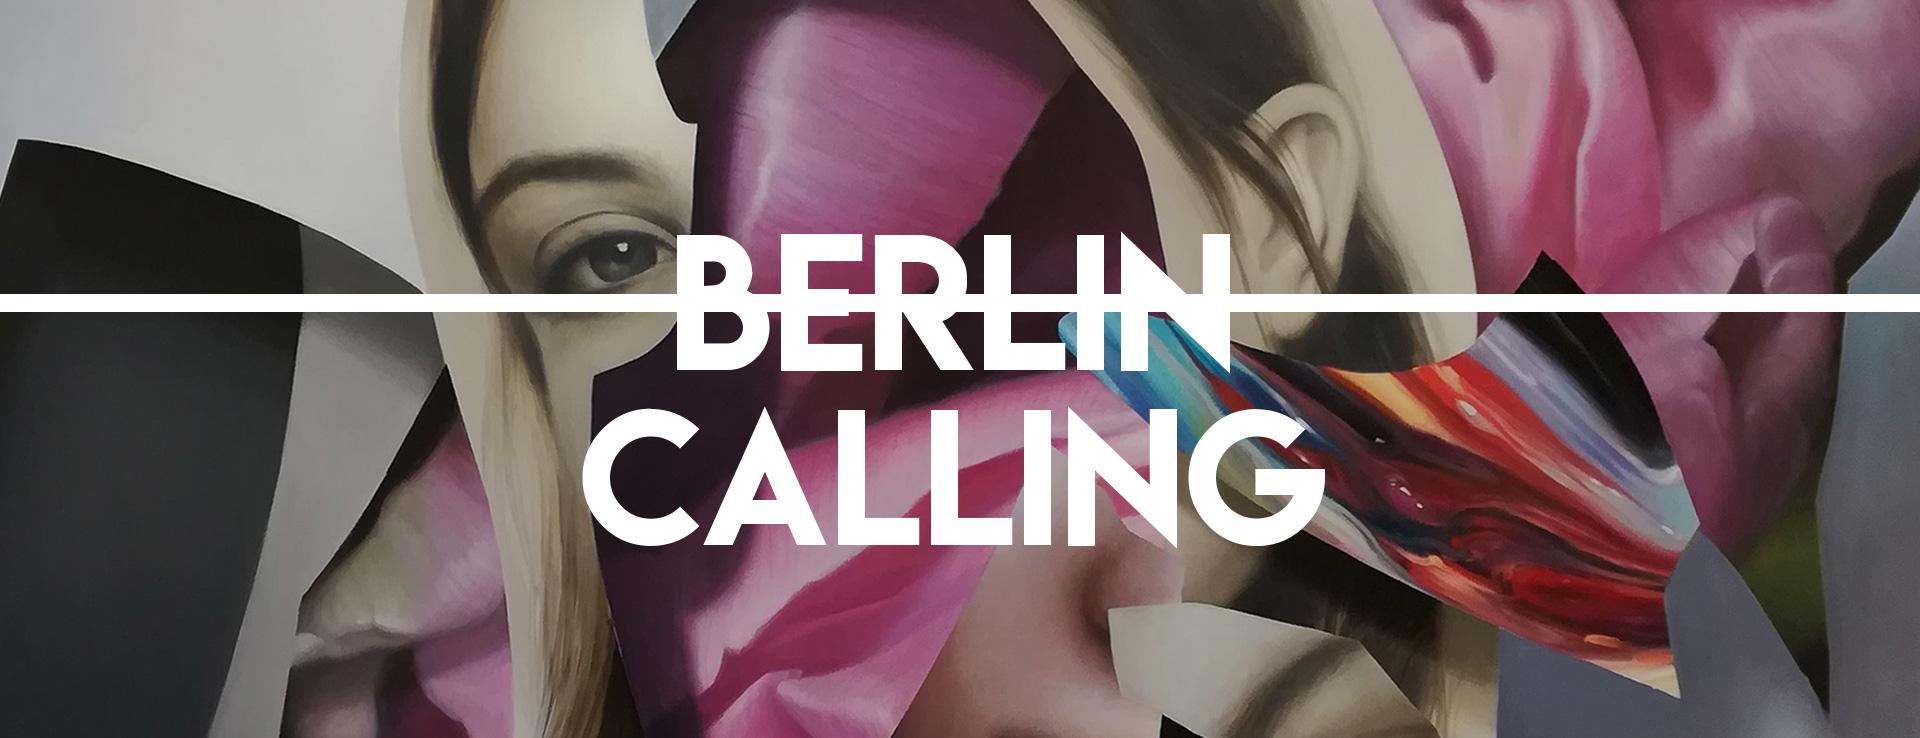 berlin_caling